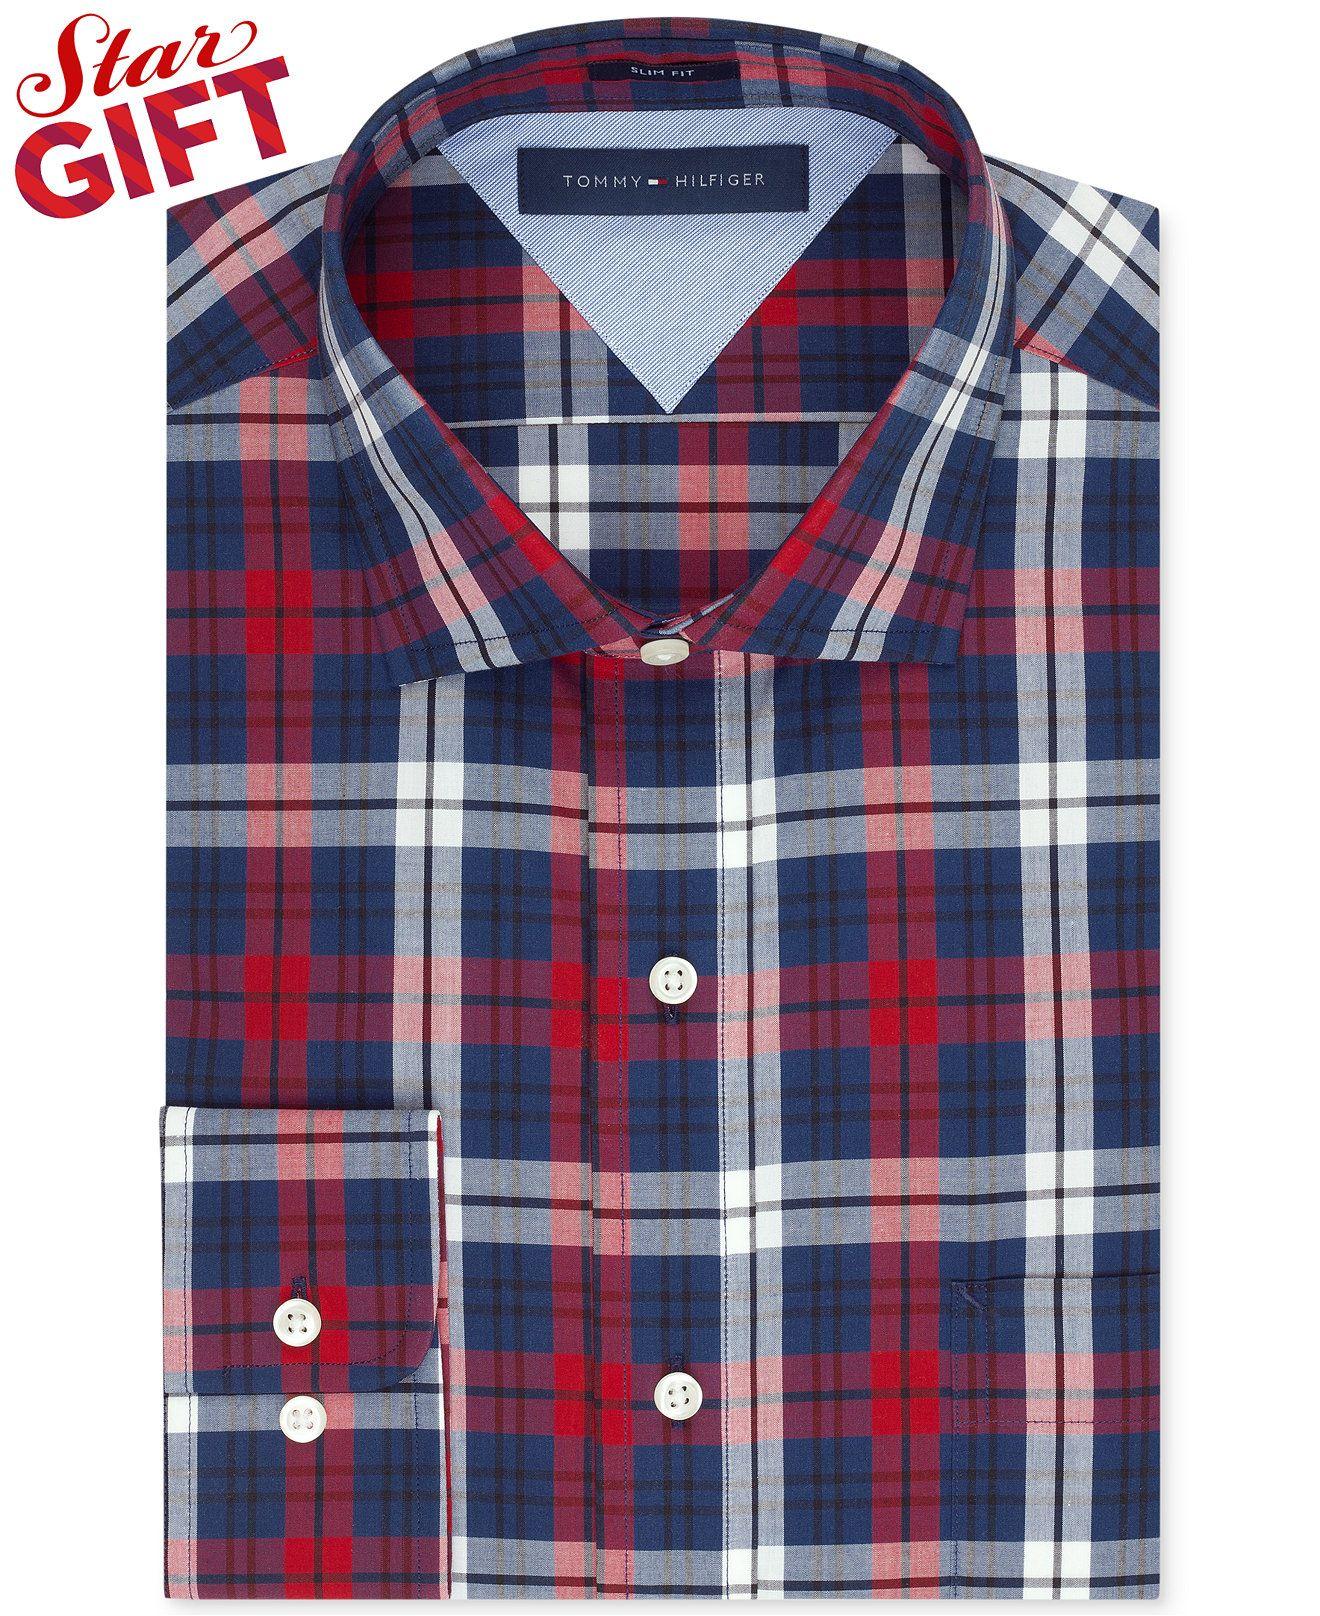 6b98f28ecac9c Tommy Hilfiger Slim-Fit Red and Blue Plaid Dress Shirt - Dress Shirts - Men  - Macy s  35